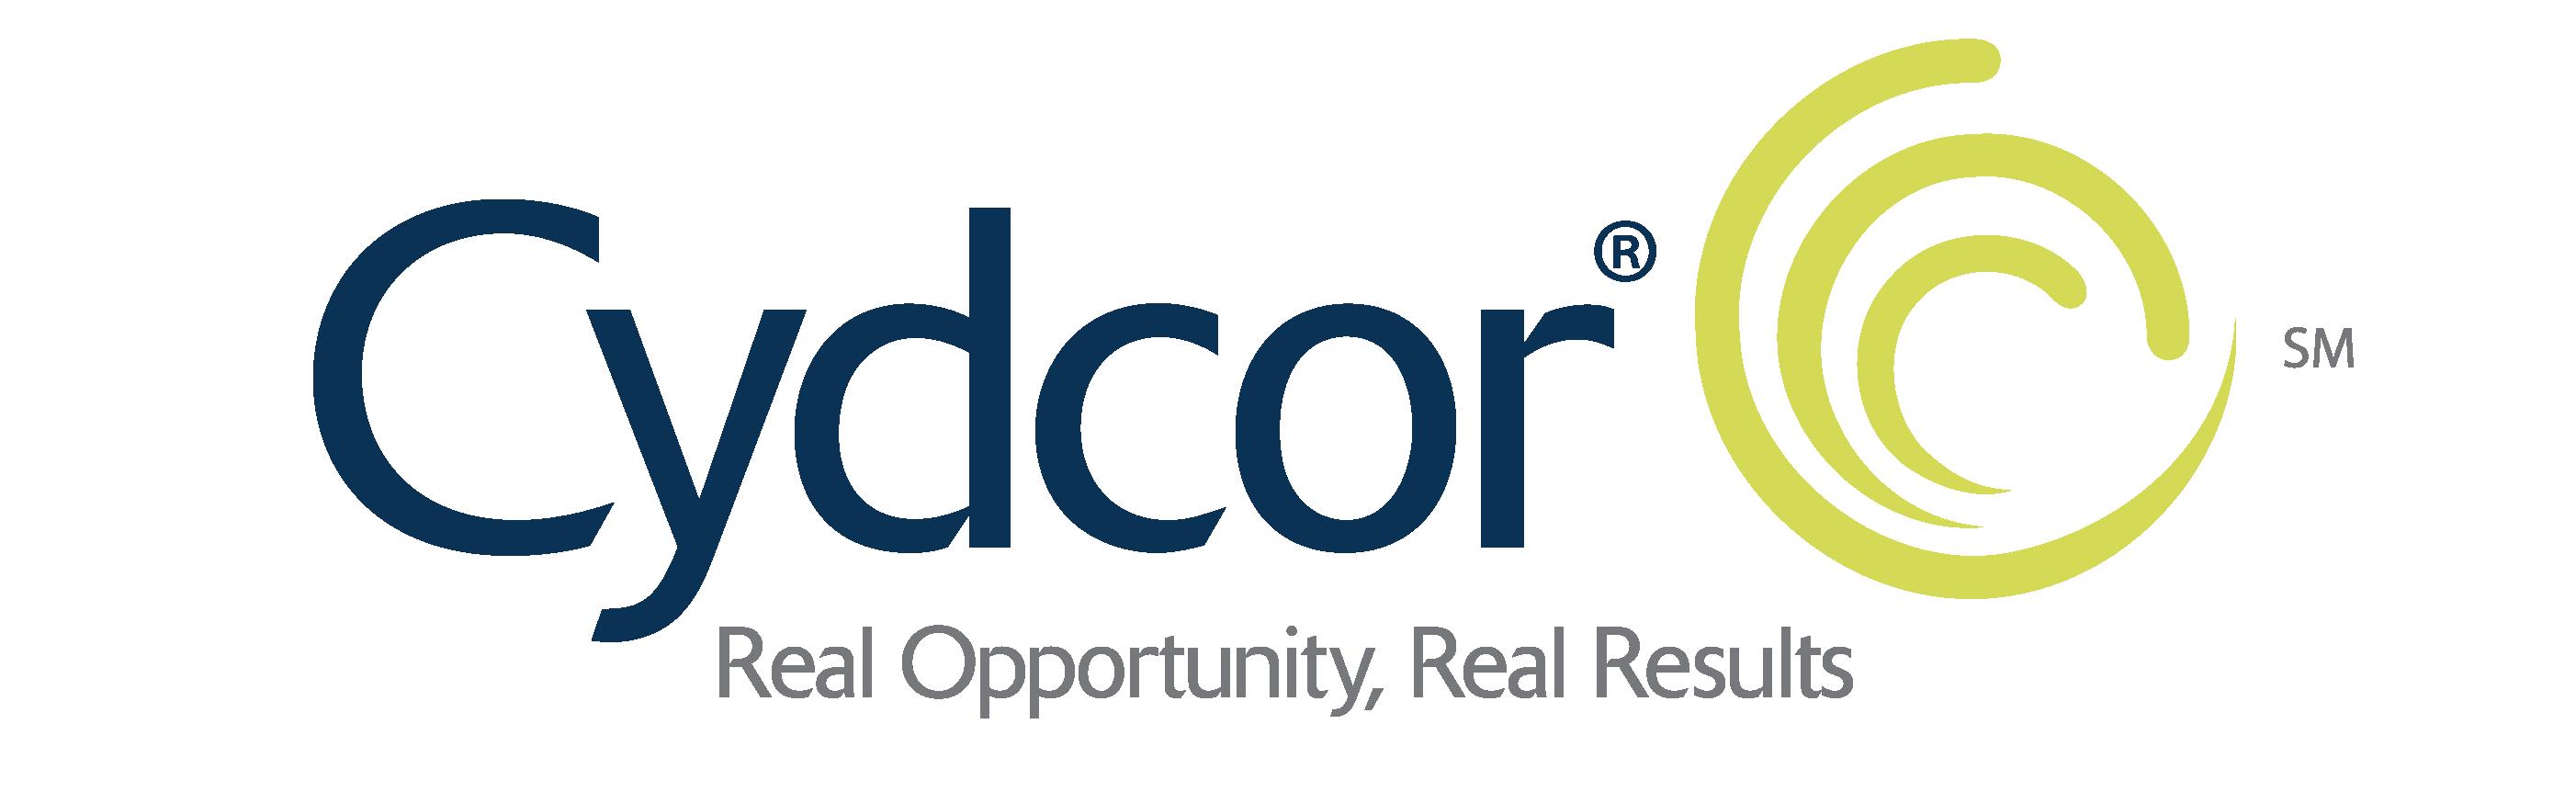 Cydor Sponsor Logo